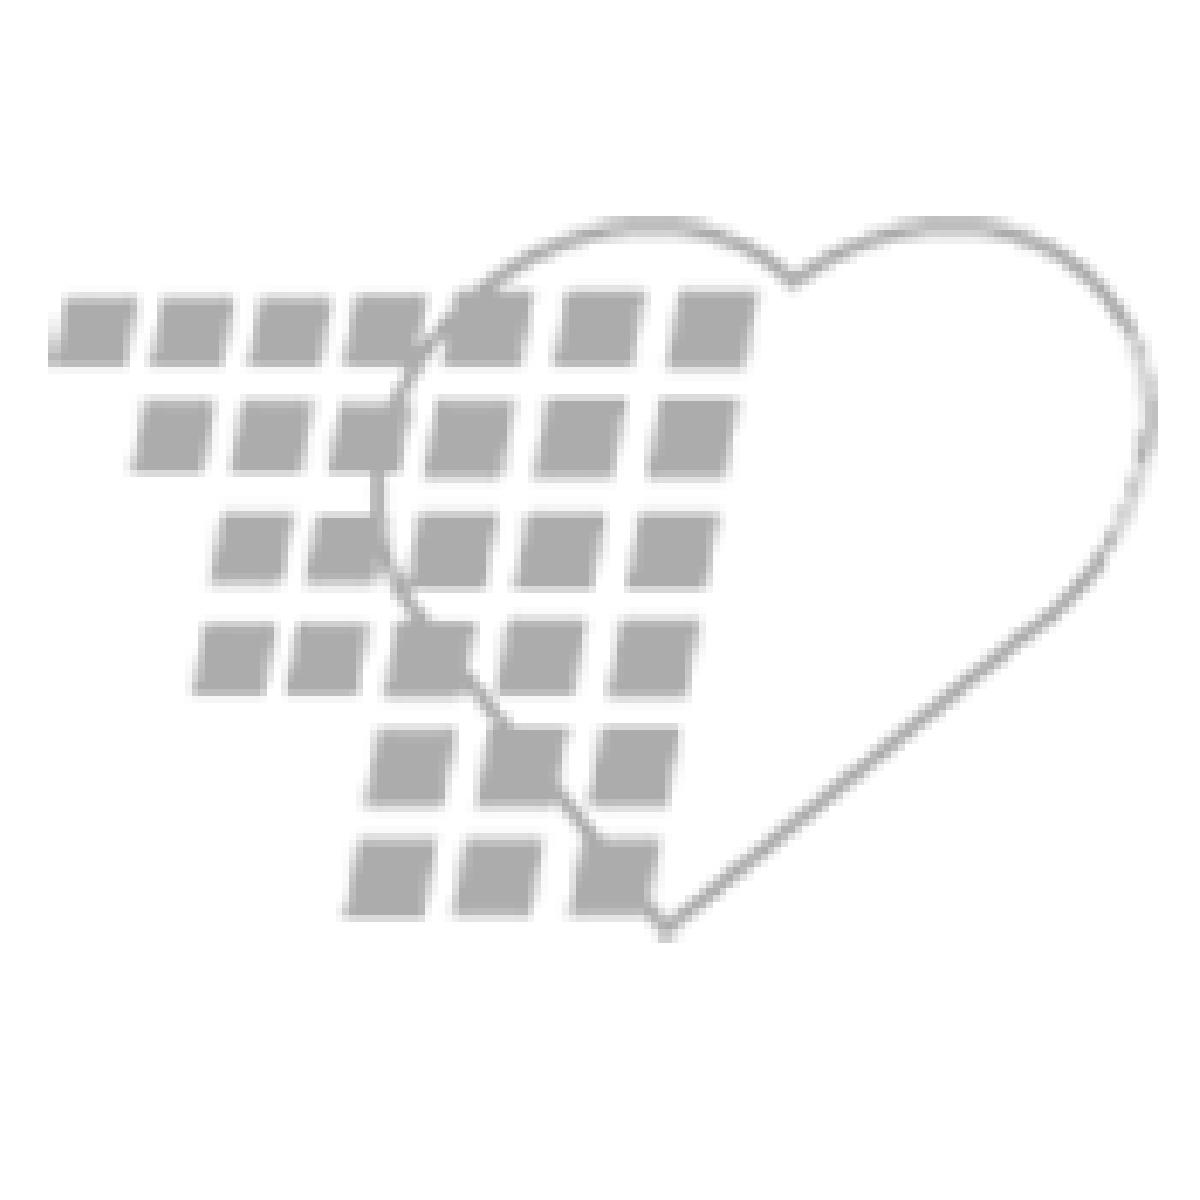 06-93-7517 Demo Dose® Morphin Vial/IV Kit